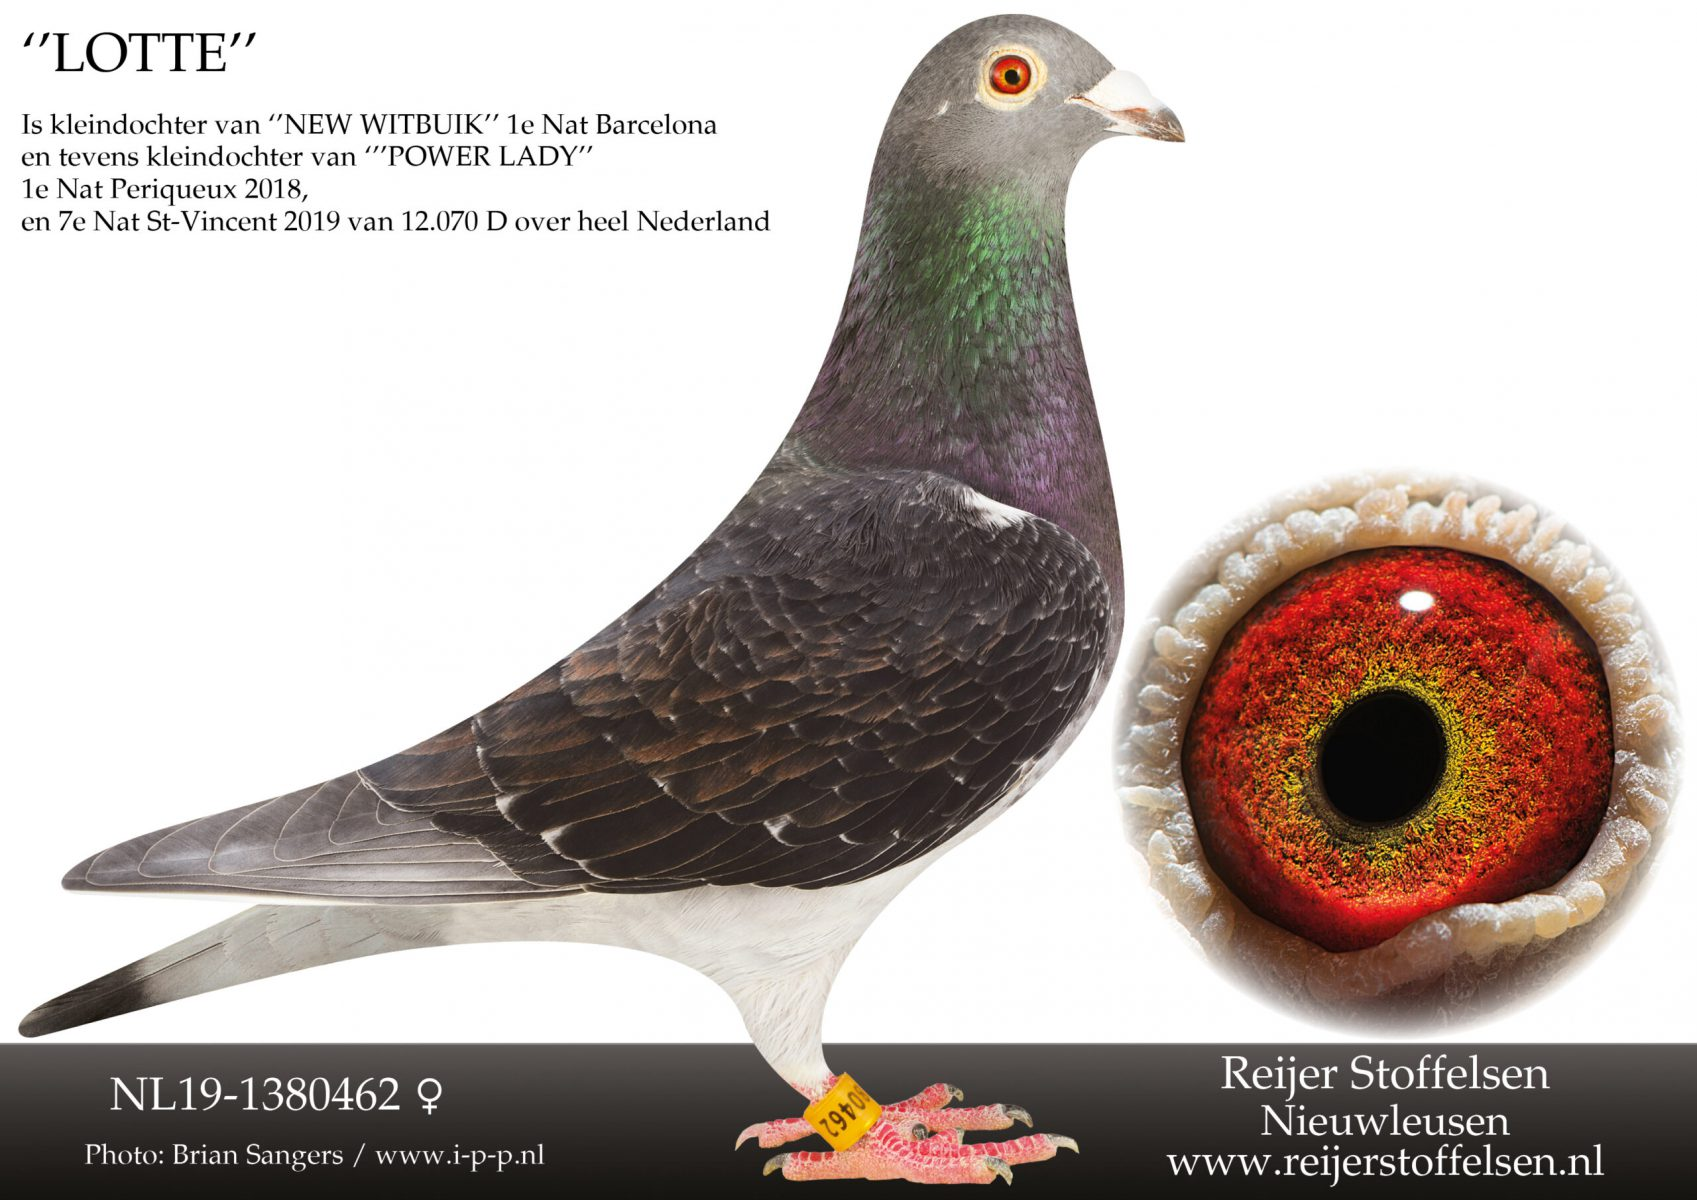 NL19-1380462-scaled